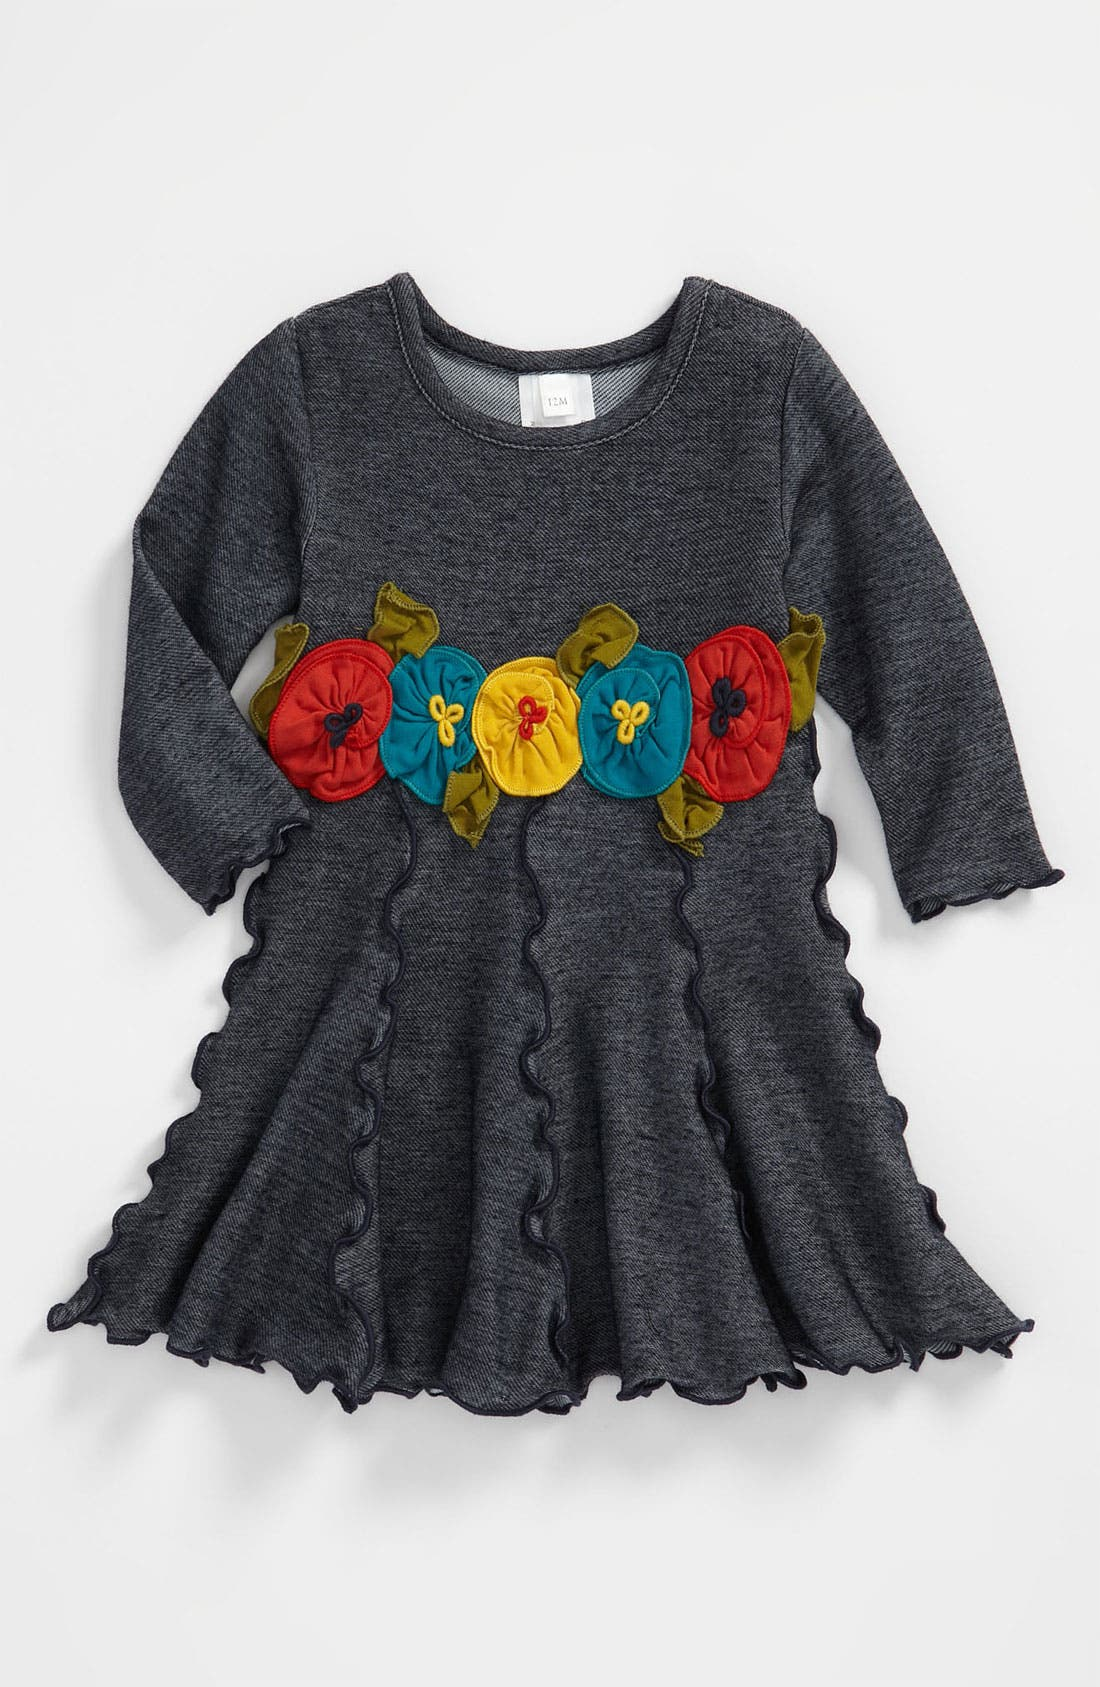 Alternate Image 1 Selected - Love U Lots Ruffle Trimmed Dress (Toddler)